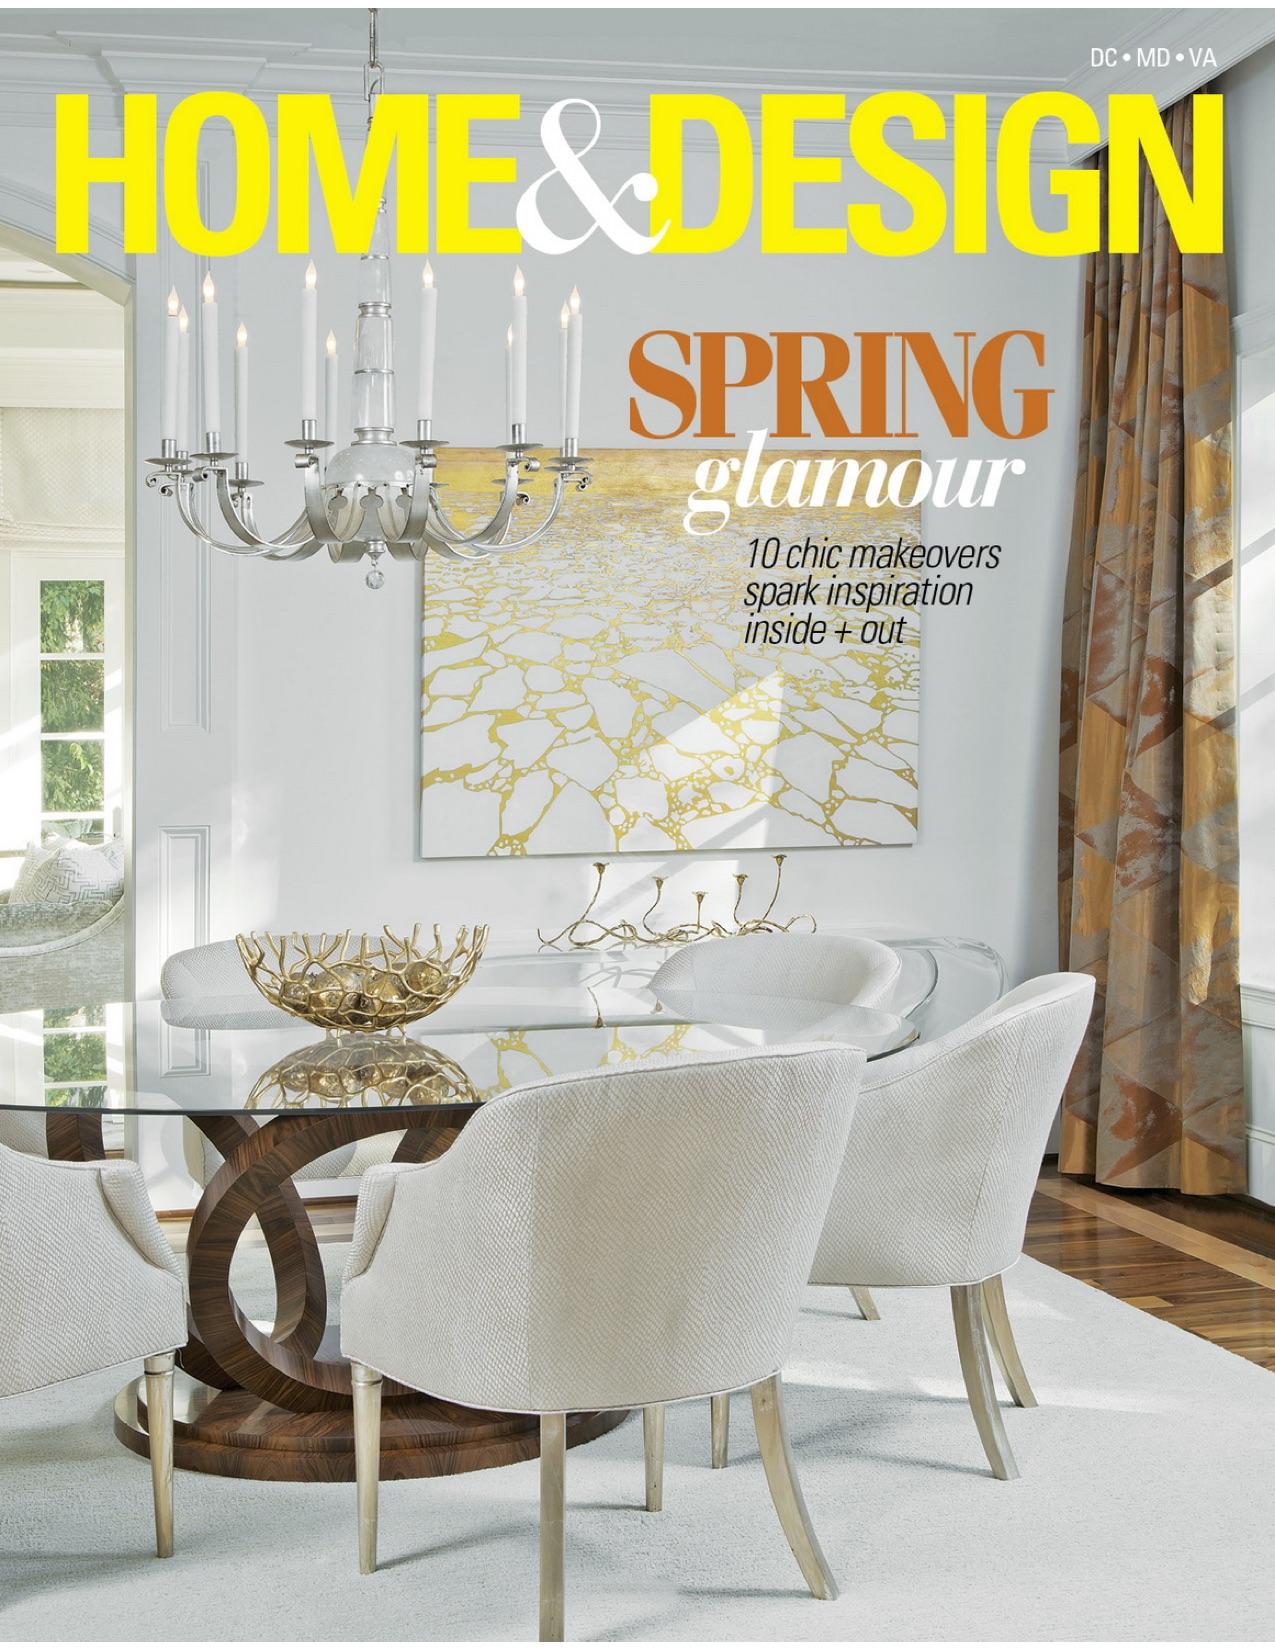 HOME & DESIGN, SPRING 2019